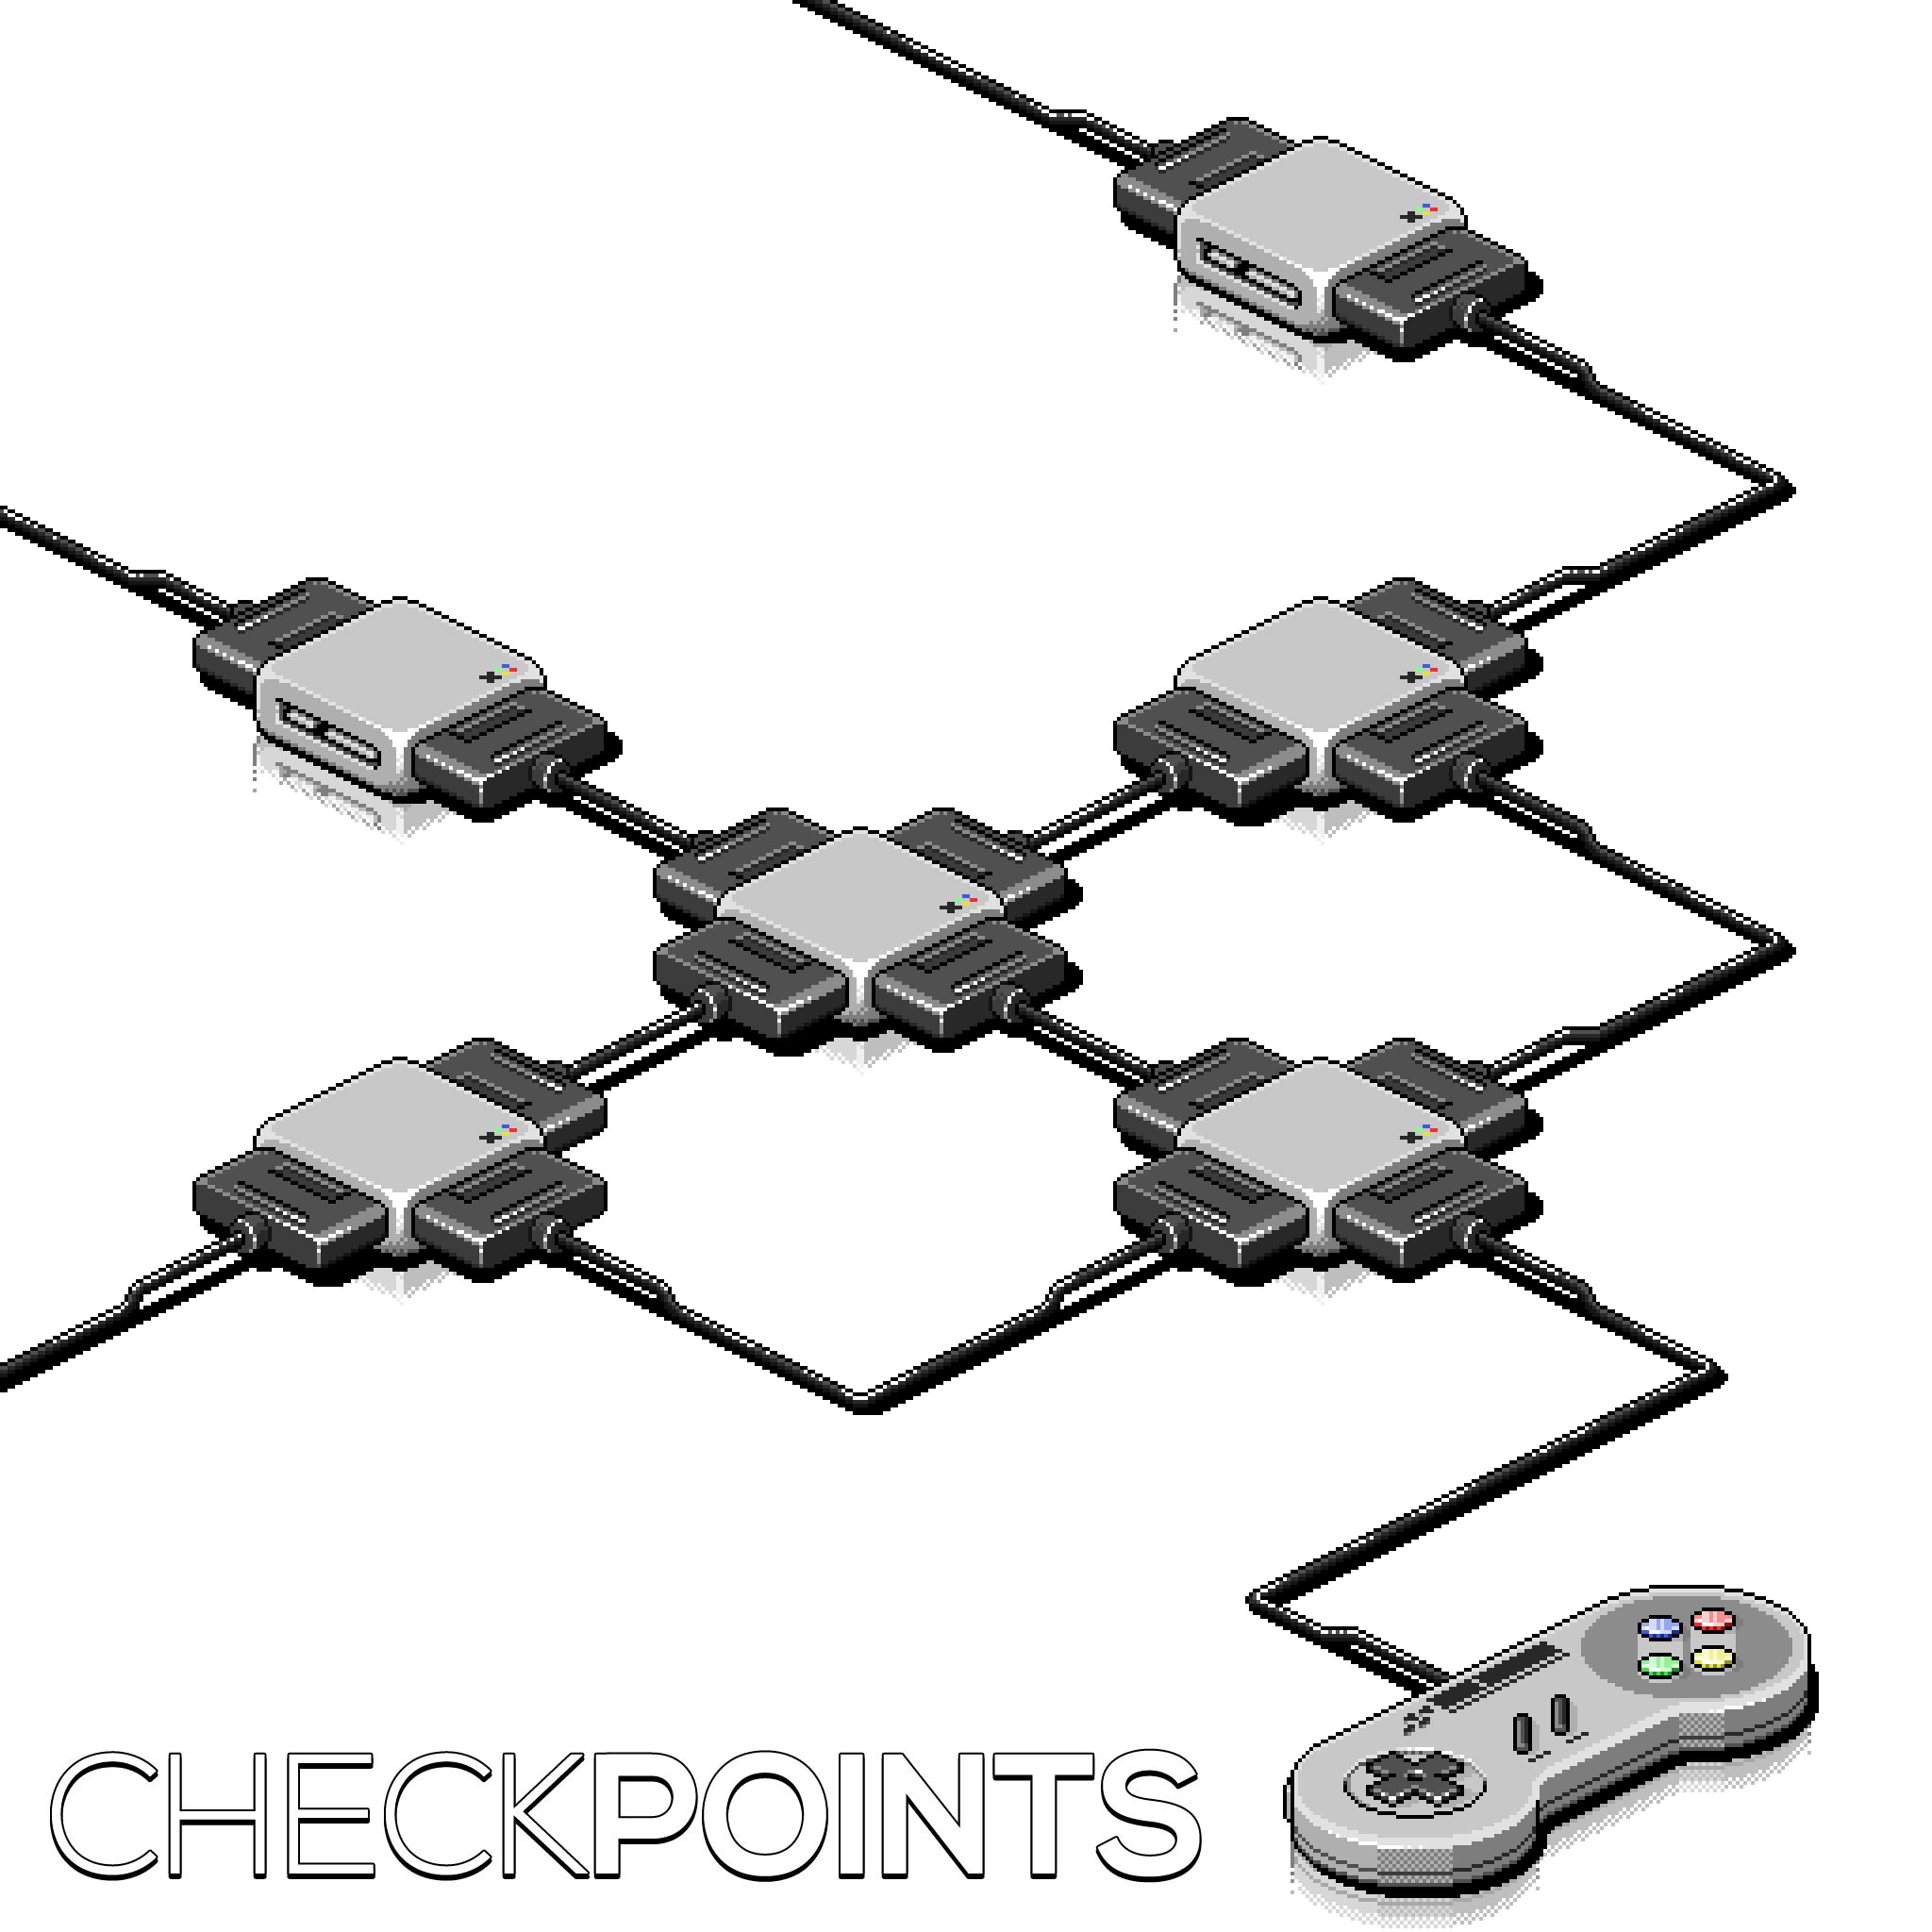 checkpoints final NES v2b 2048.png